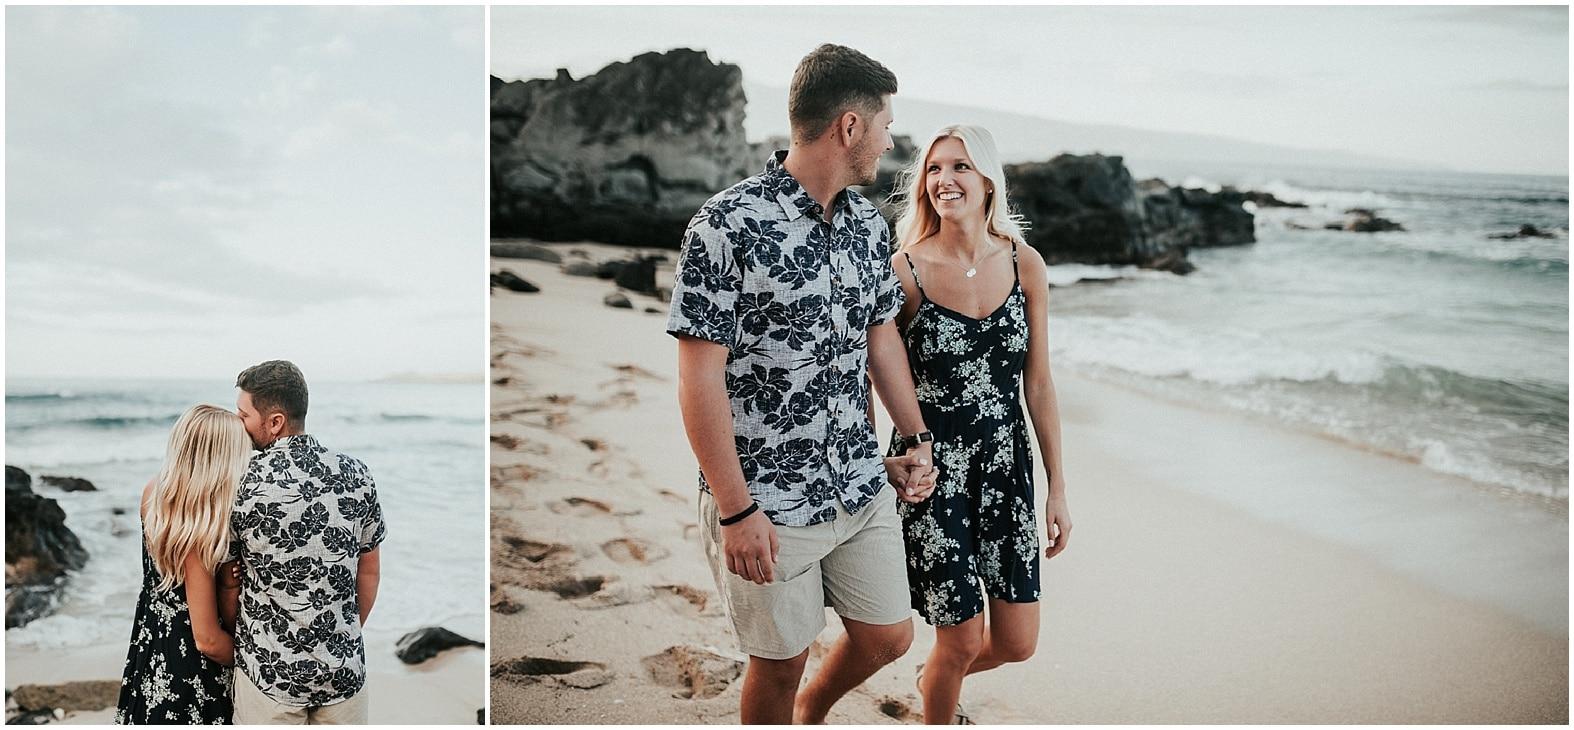 Emily and Gabe Proposal ~ Kapalua, Hawaii